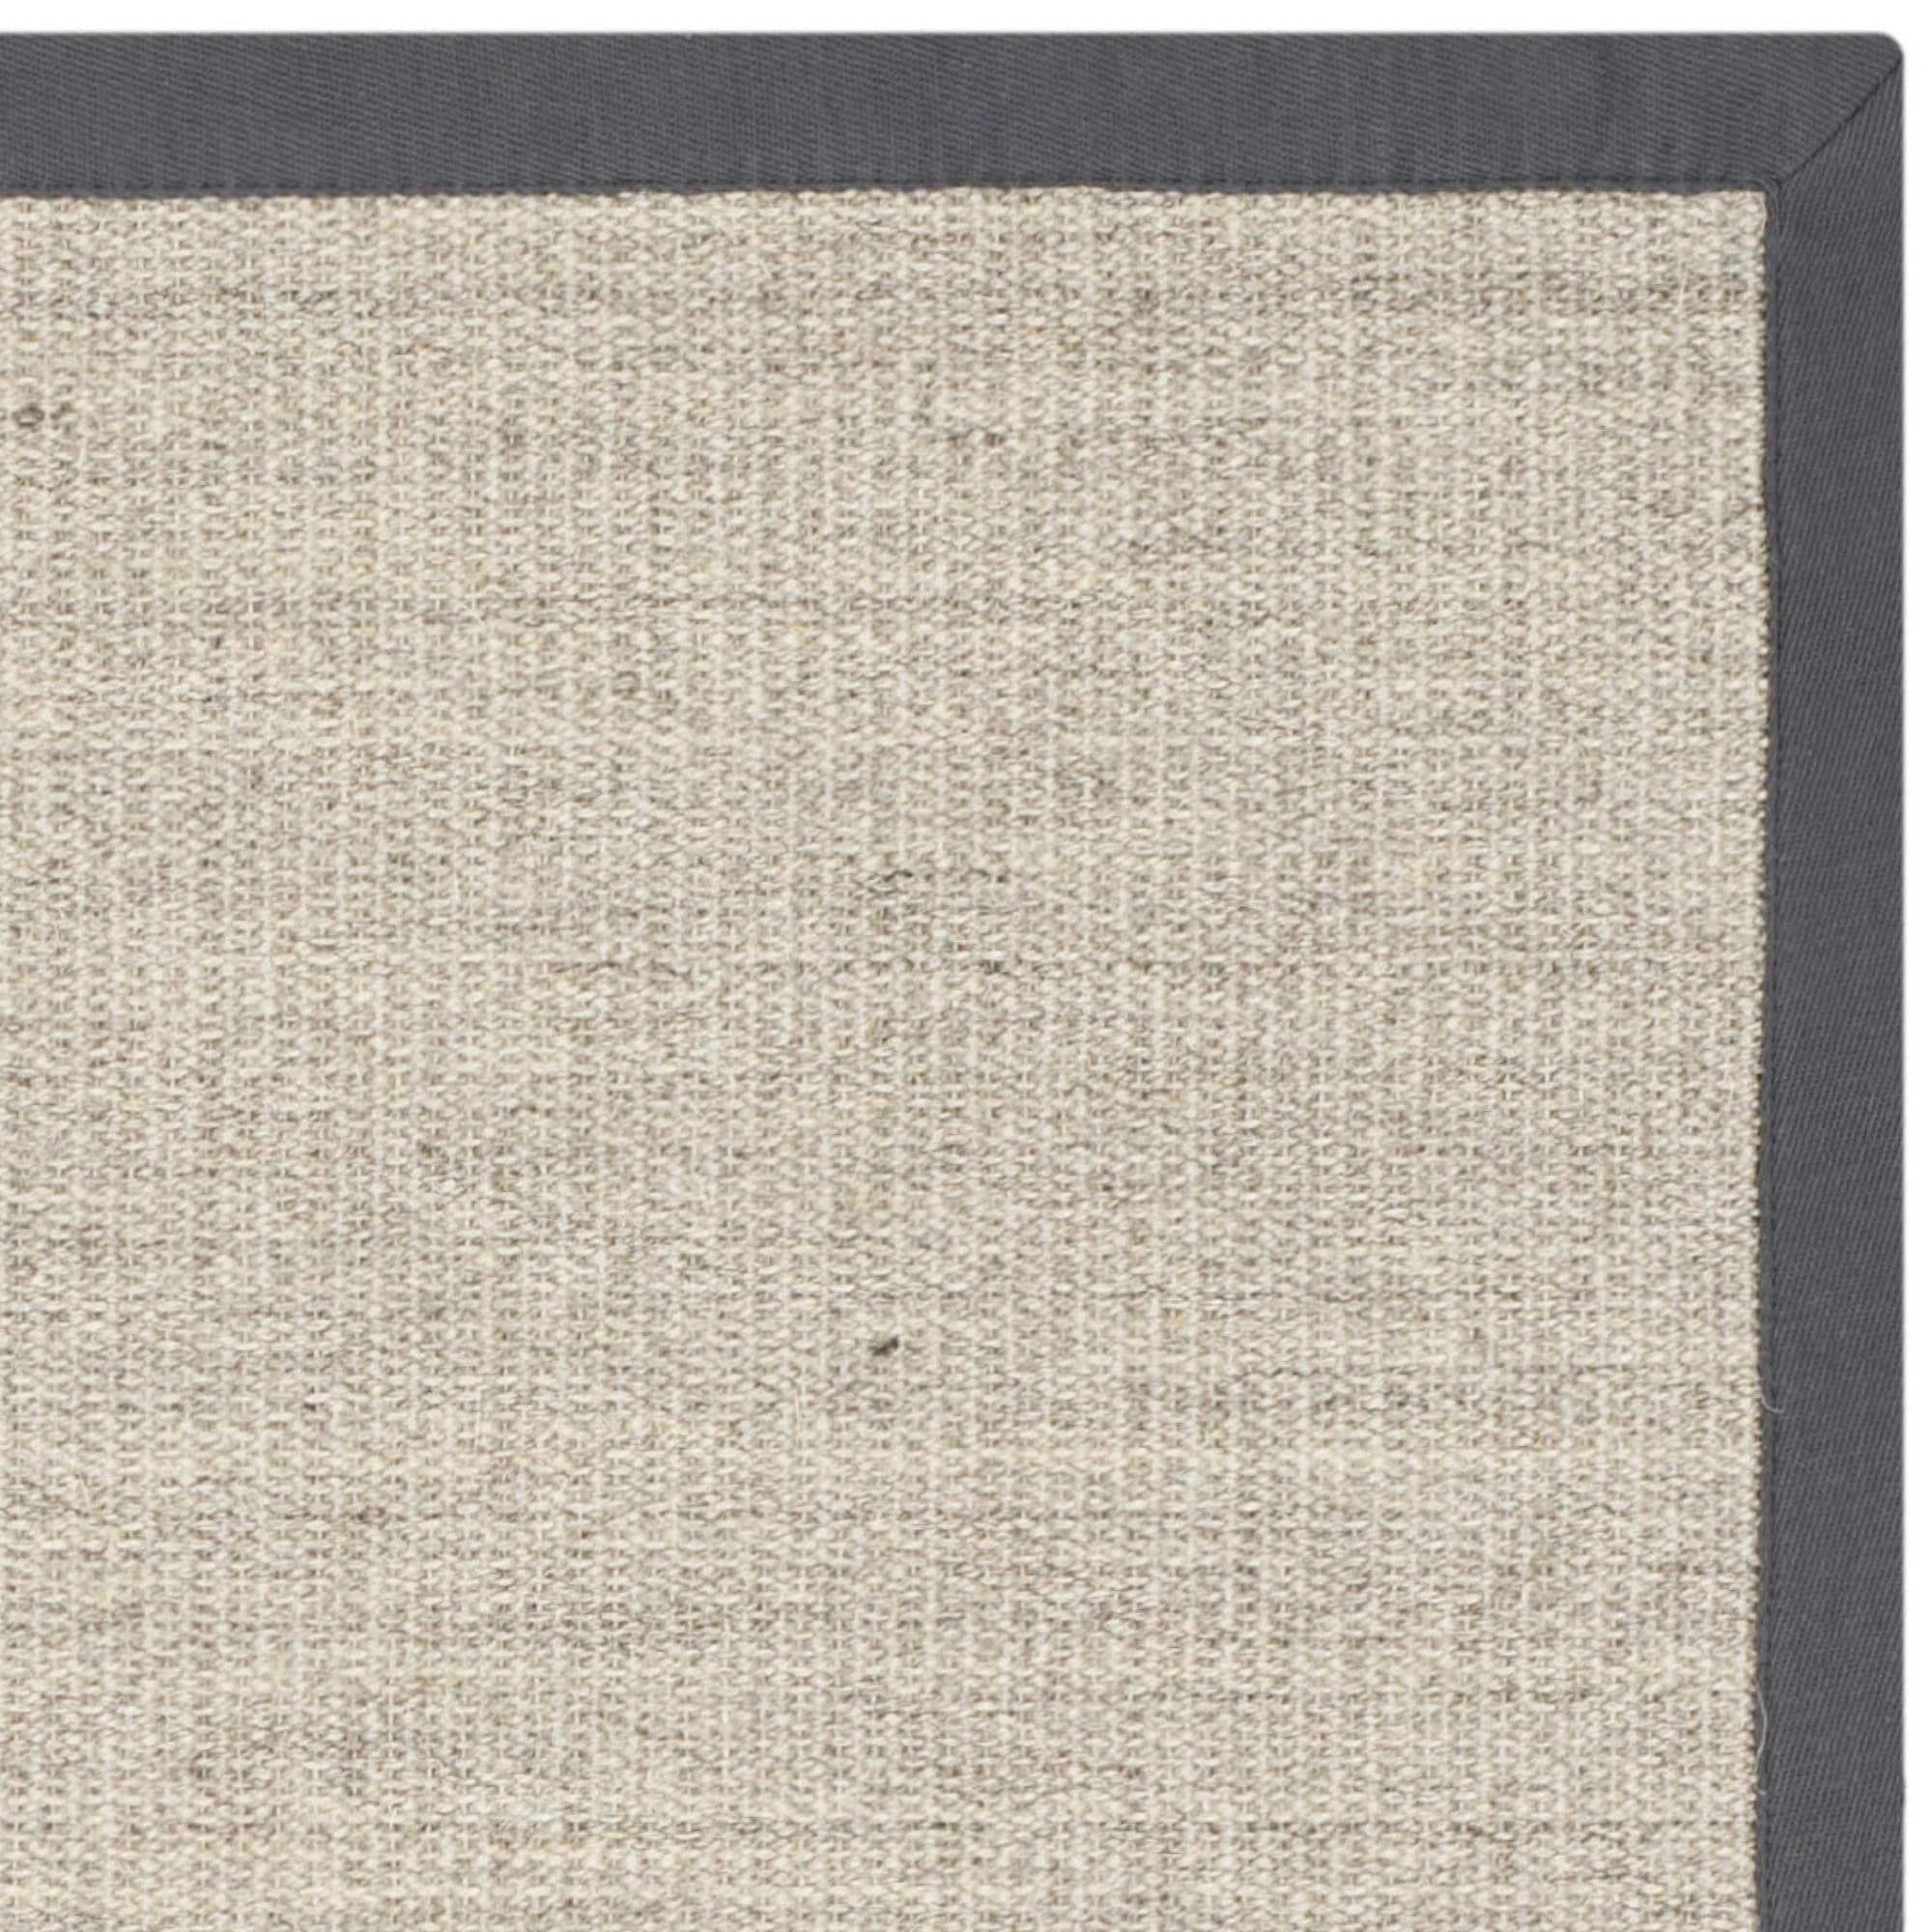 safavieh casual natural fiber hand-woven serenity marble / grey sisal rug - IVQXIFR